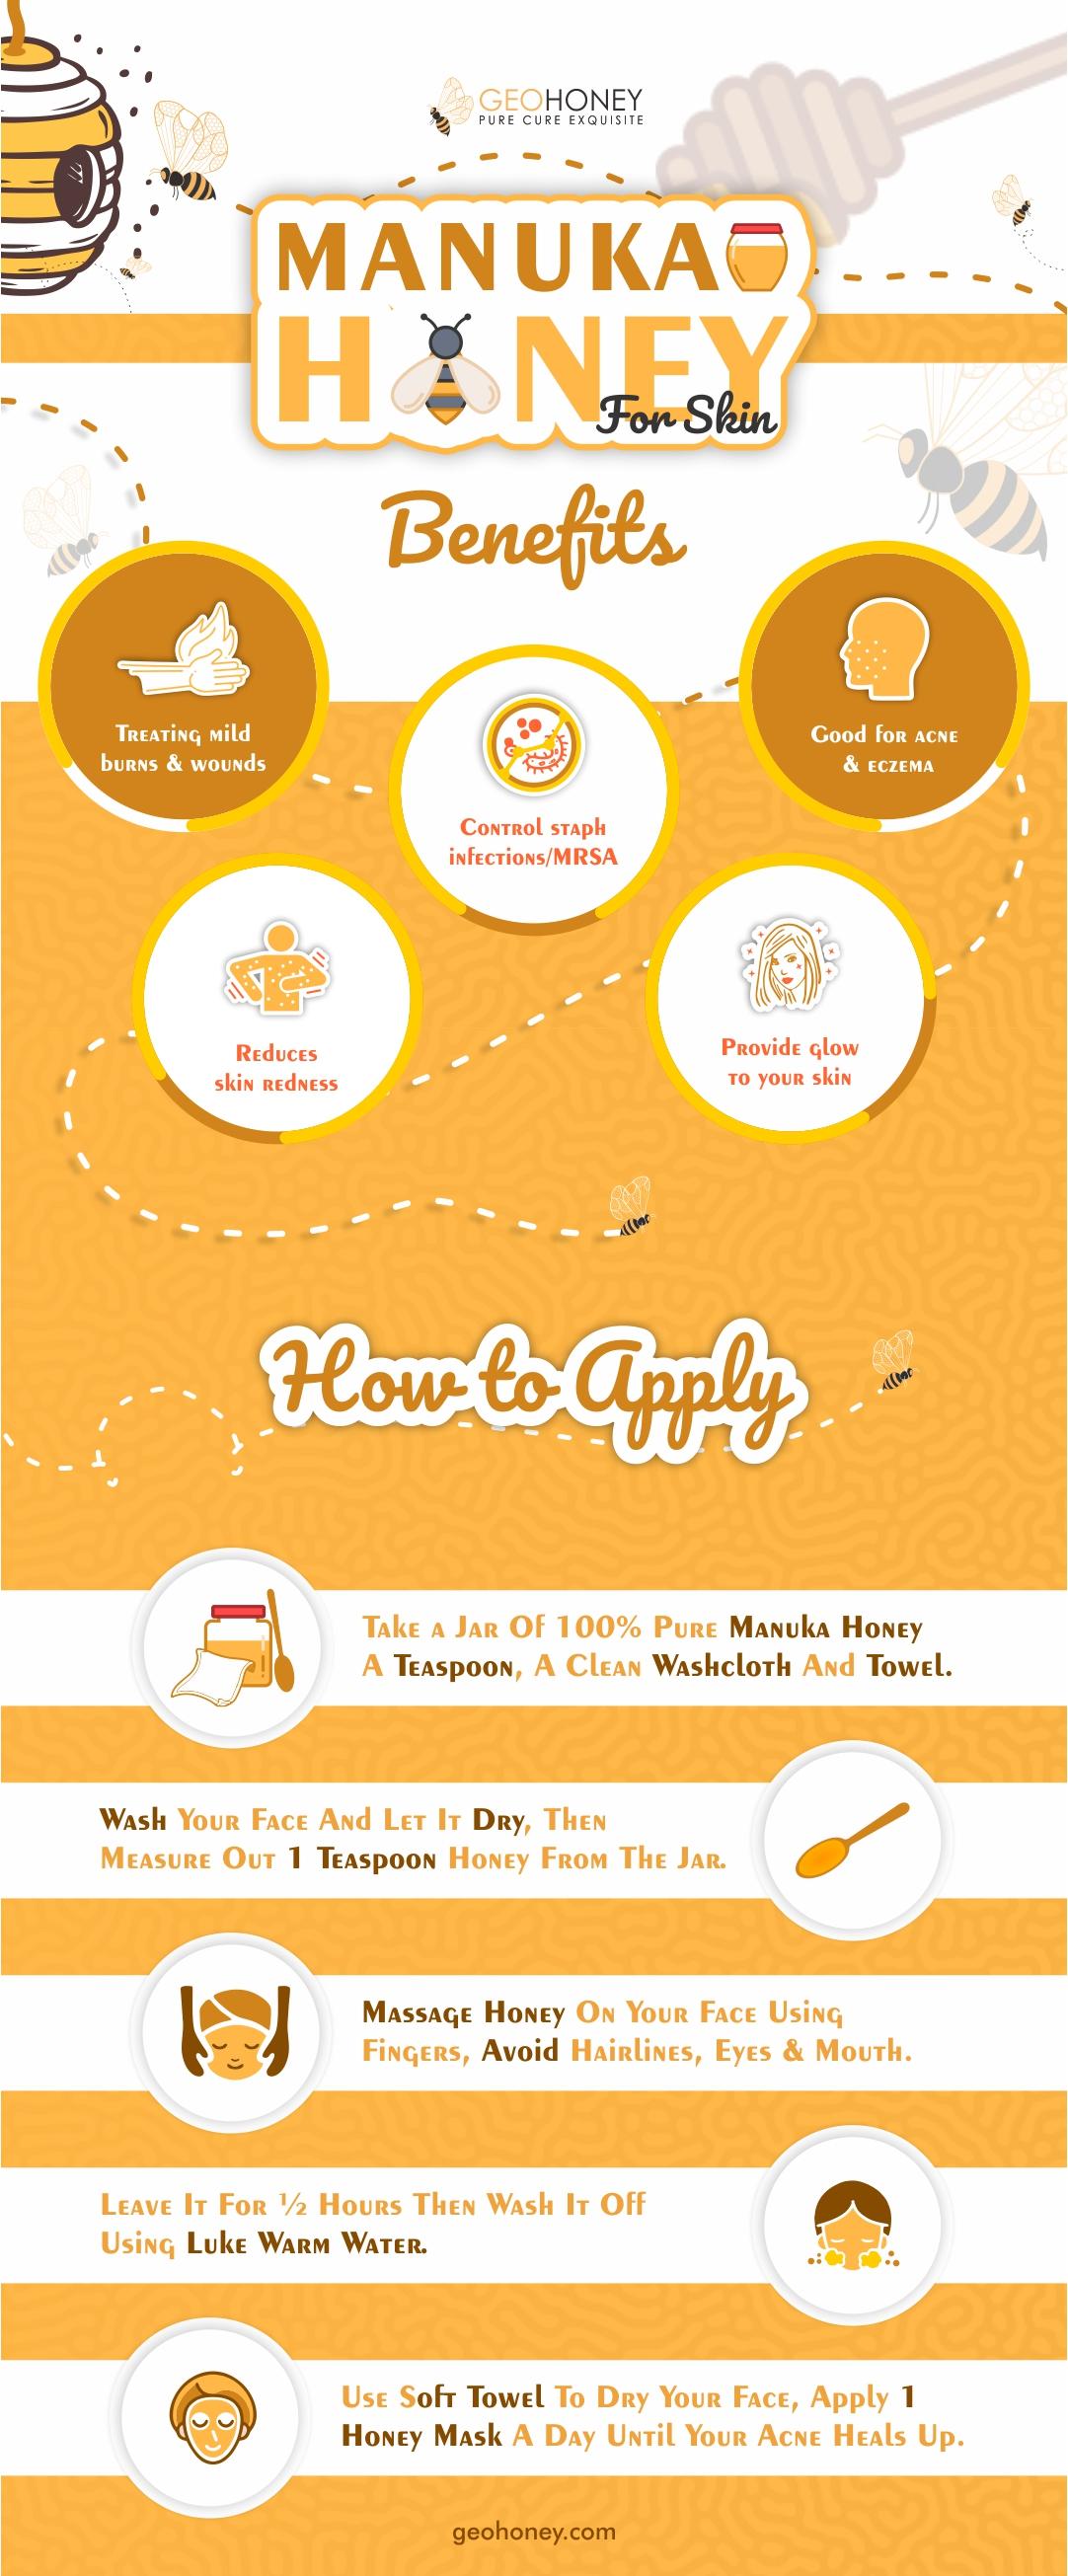 Manuka honey for skin - Geohoney